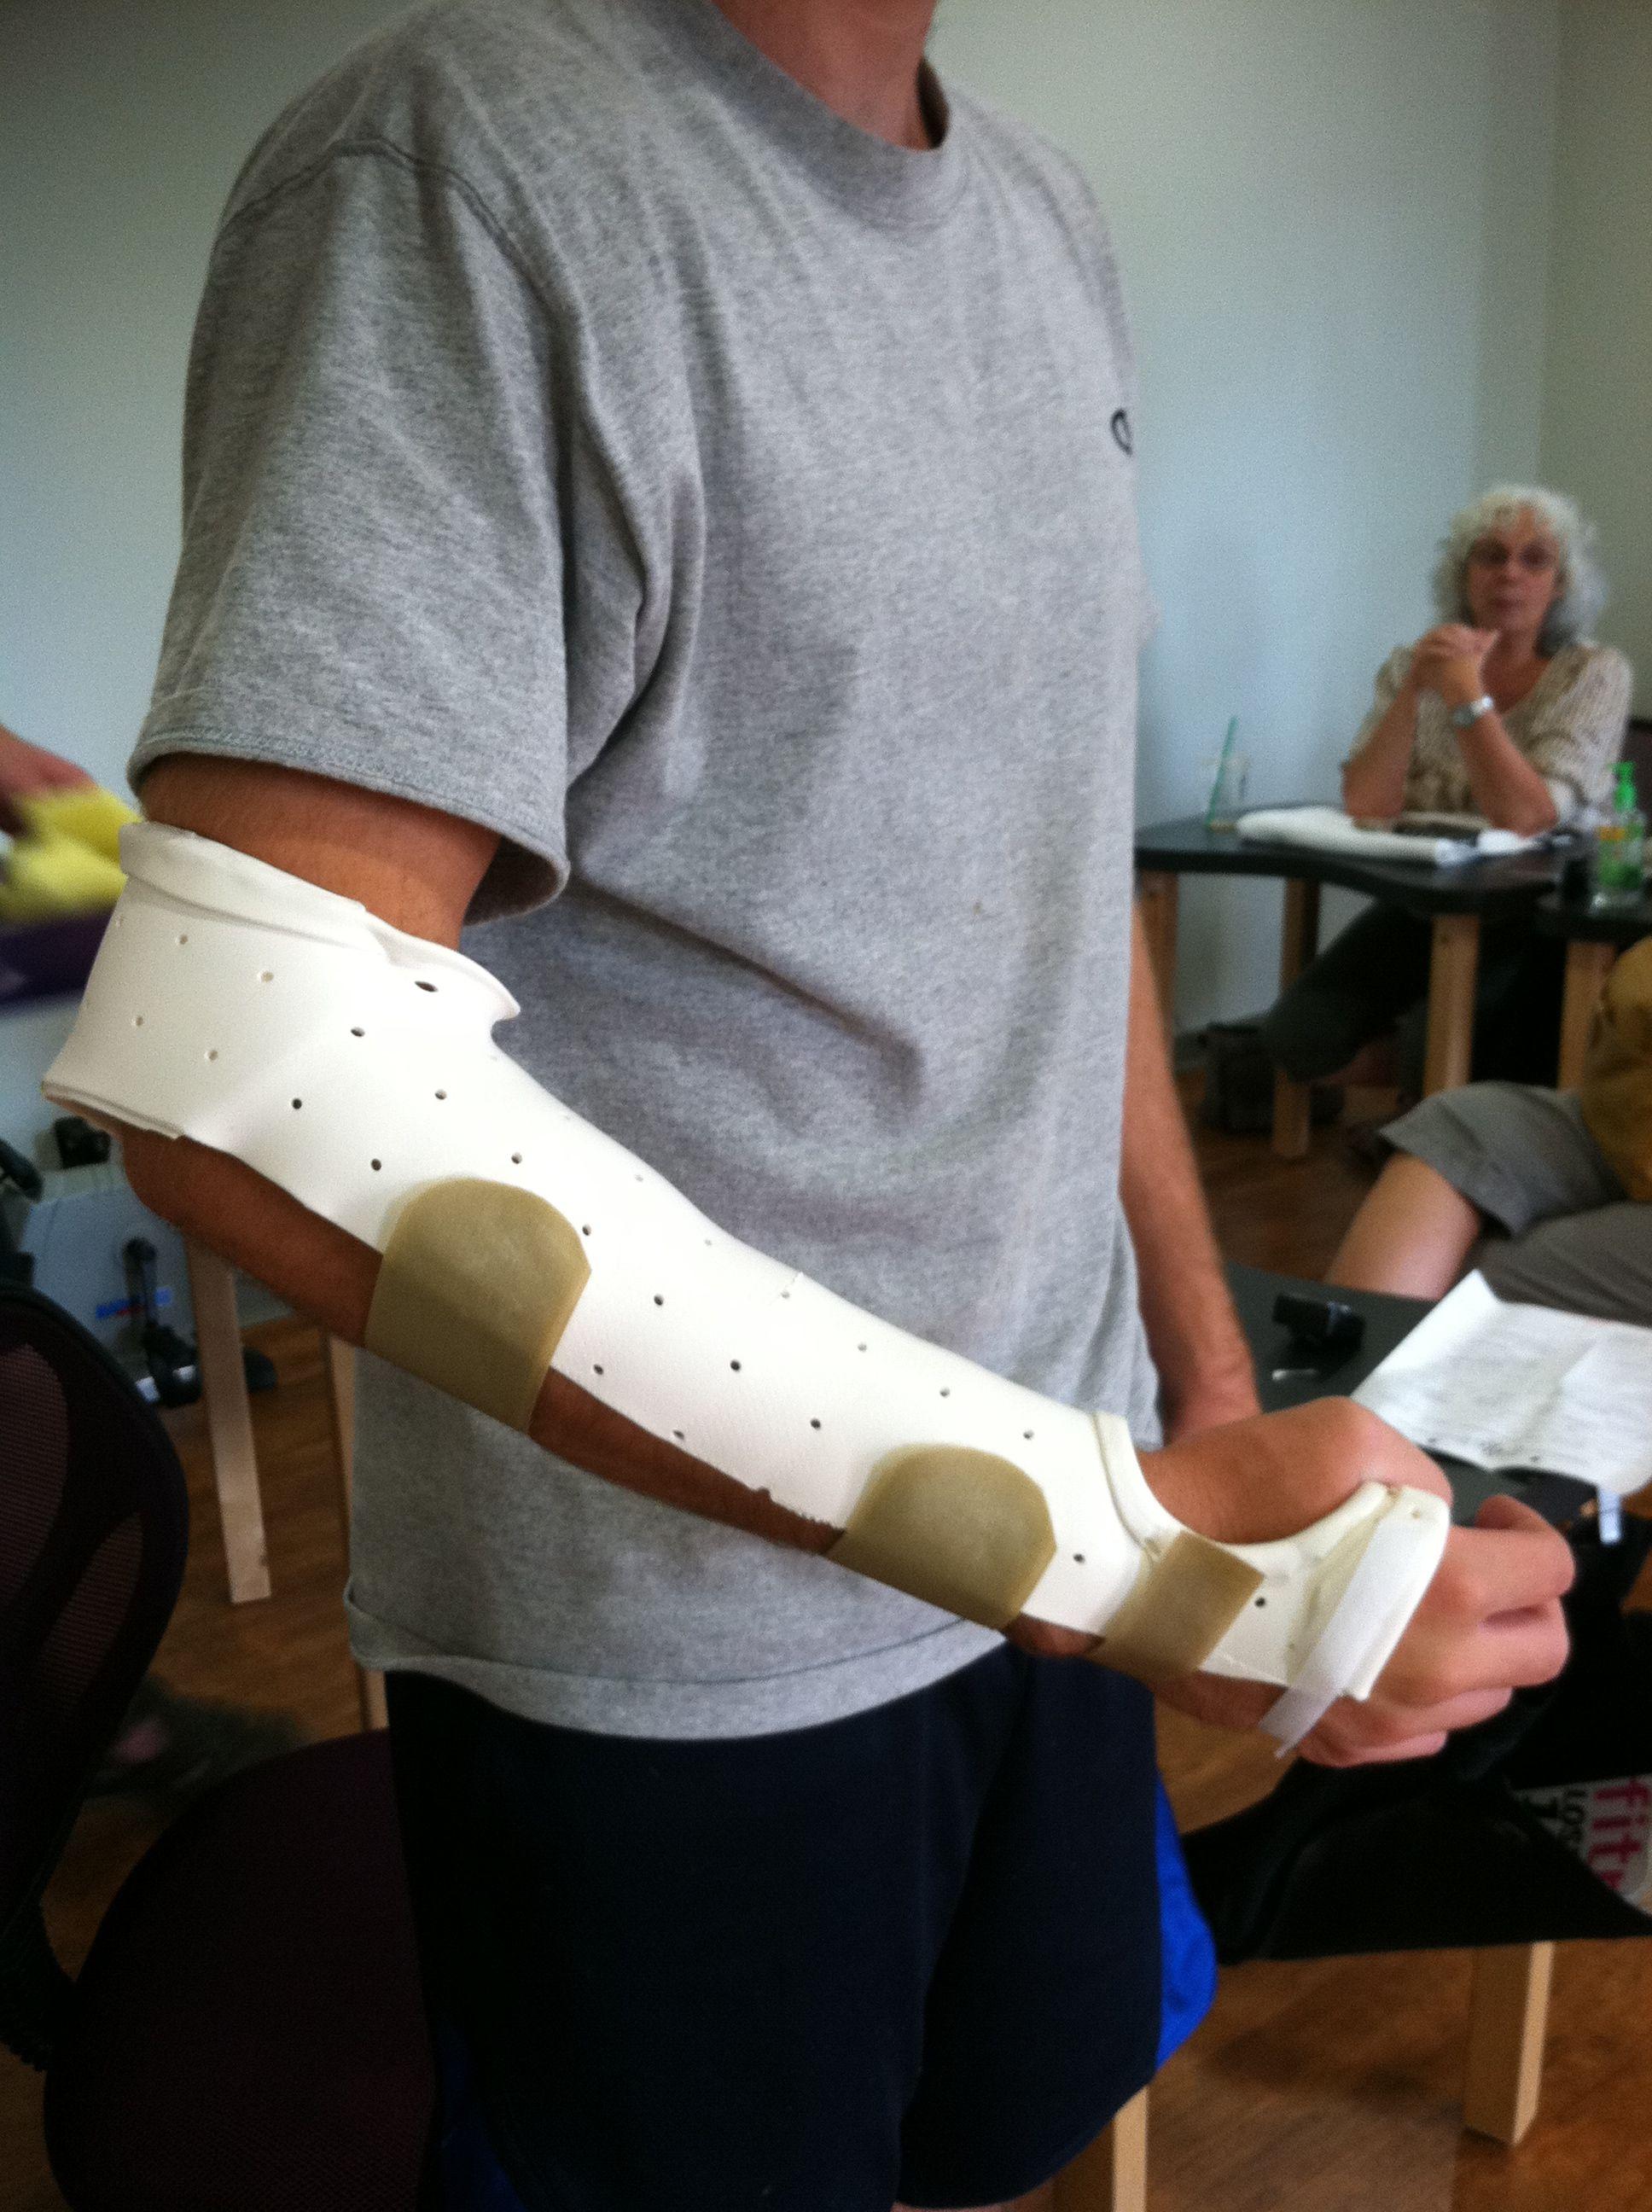 Munster Splint Prevents Forearm Rotation Often Used For Protection